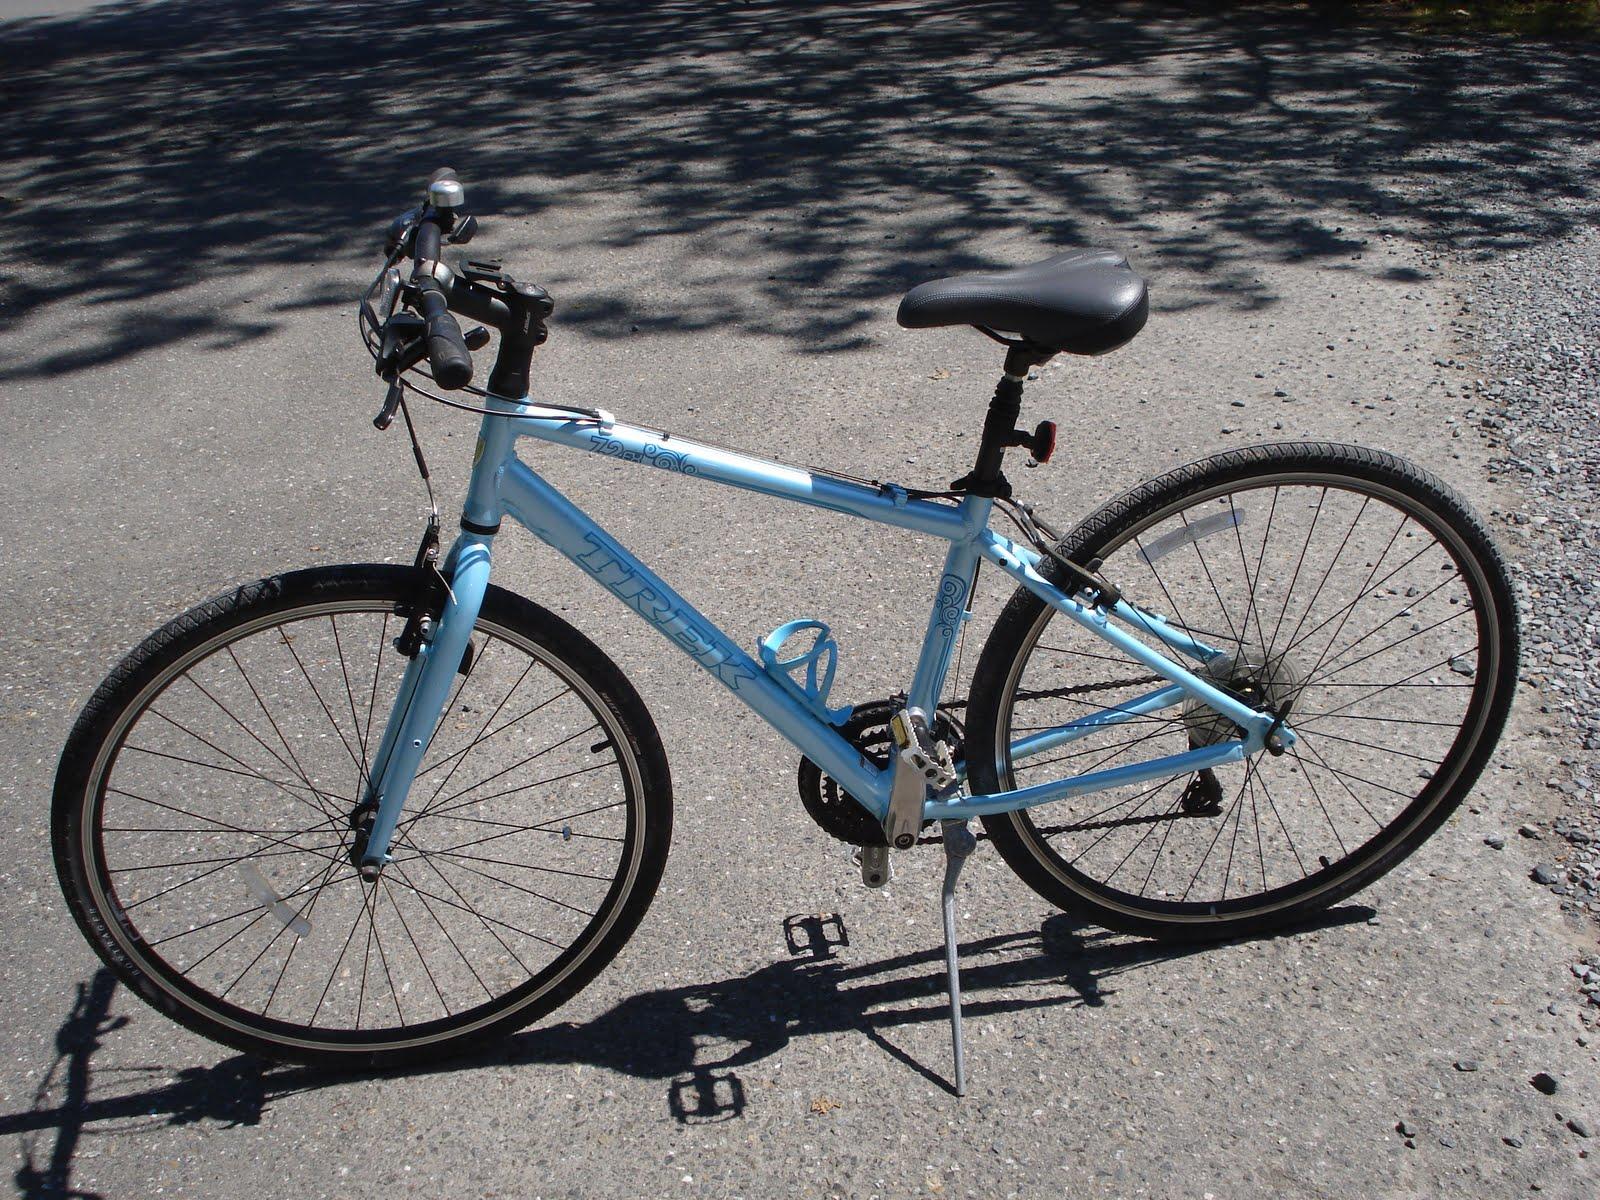 trek hybrid cycles india